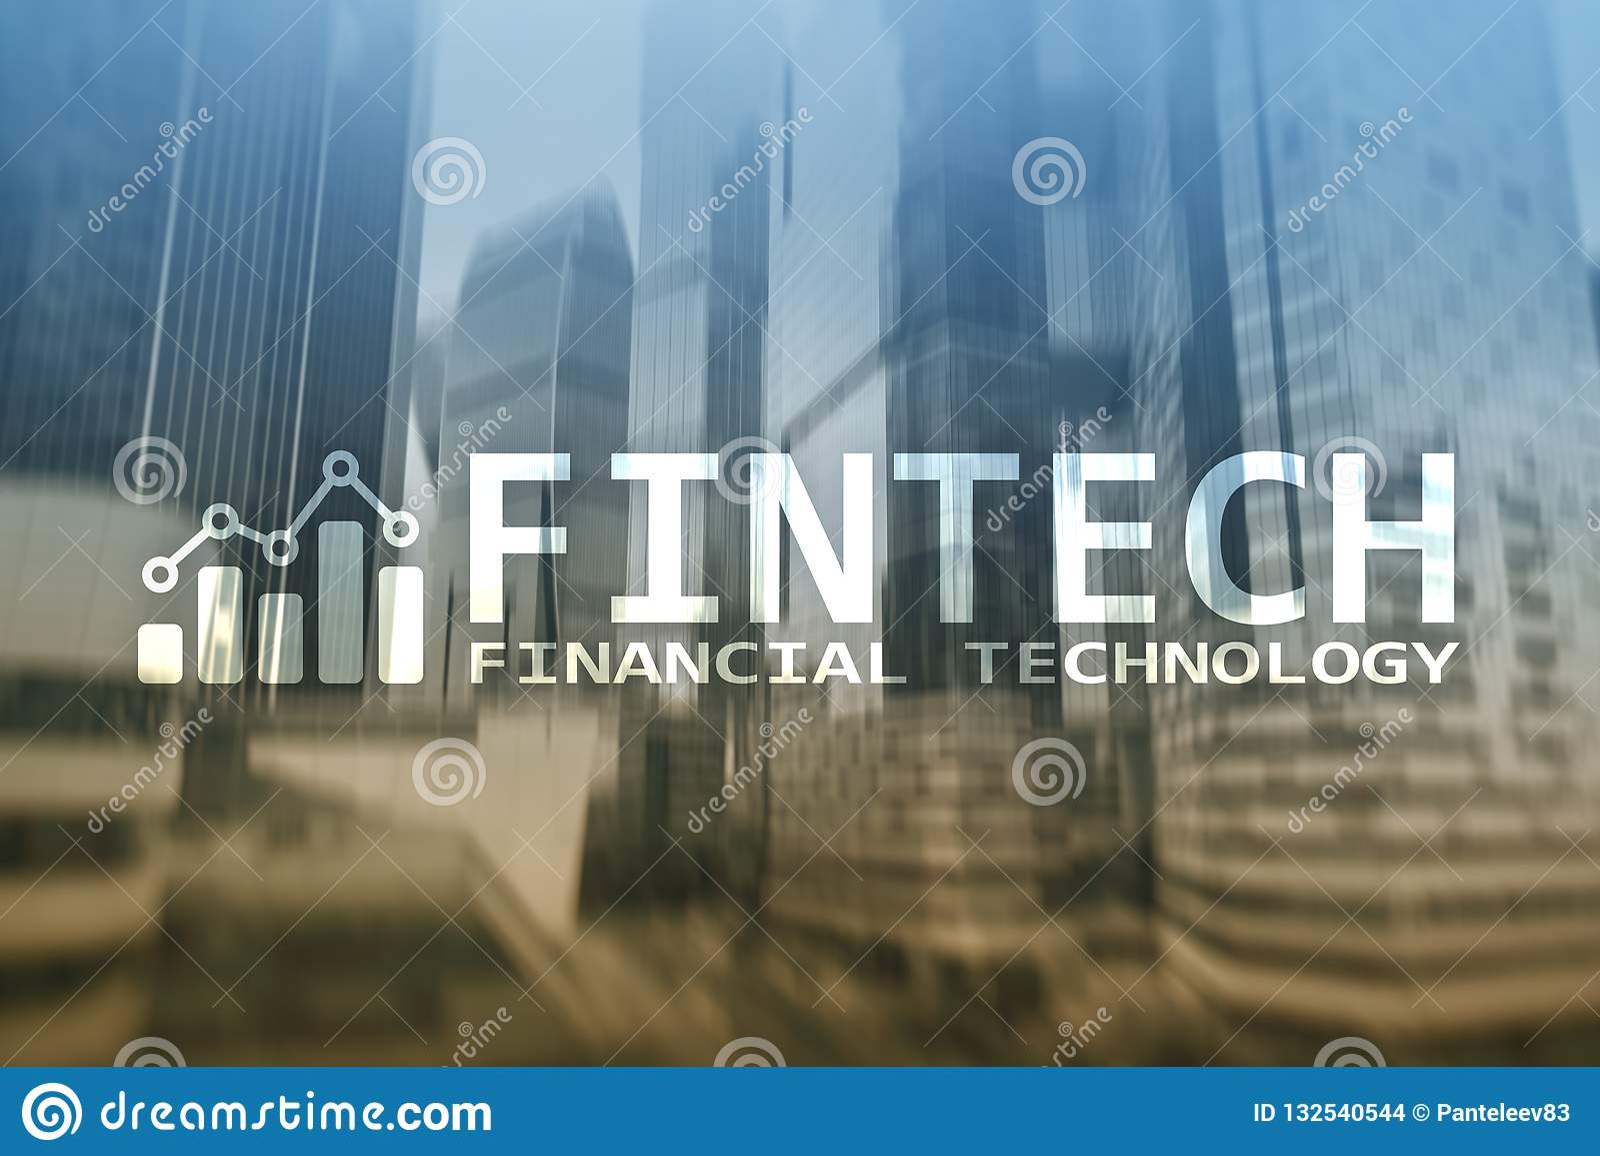 FINTECH - Financial technology, global business and information Internet communication technology. Skyscrapers background. Hi-tech